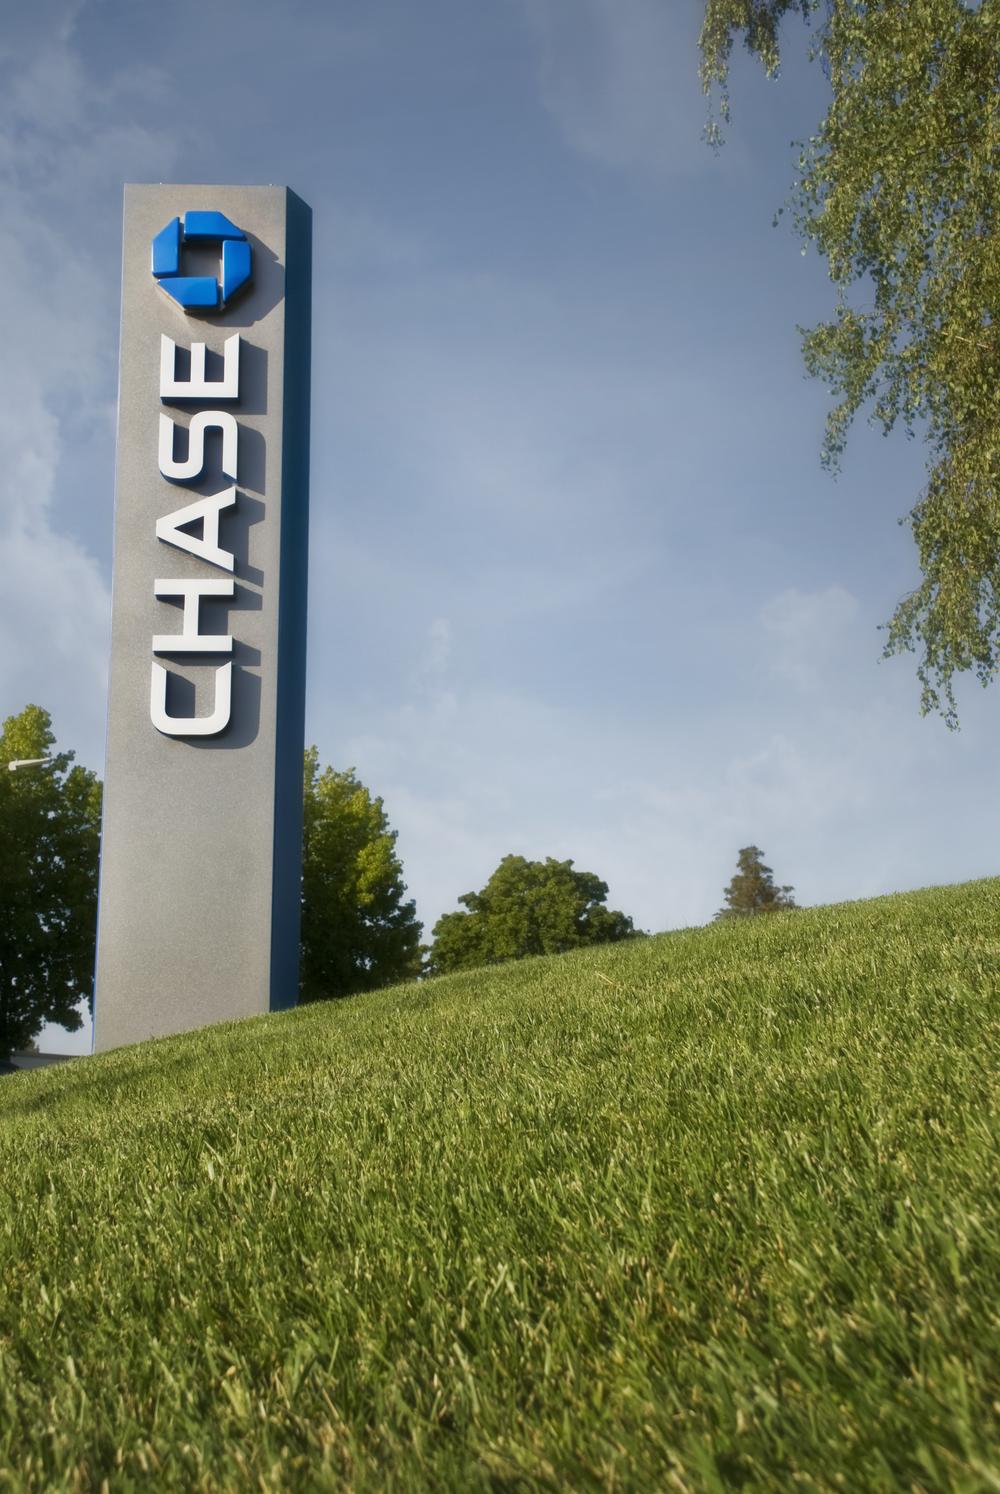 7-21-10 Chase_1.jpg